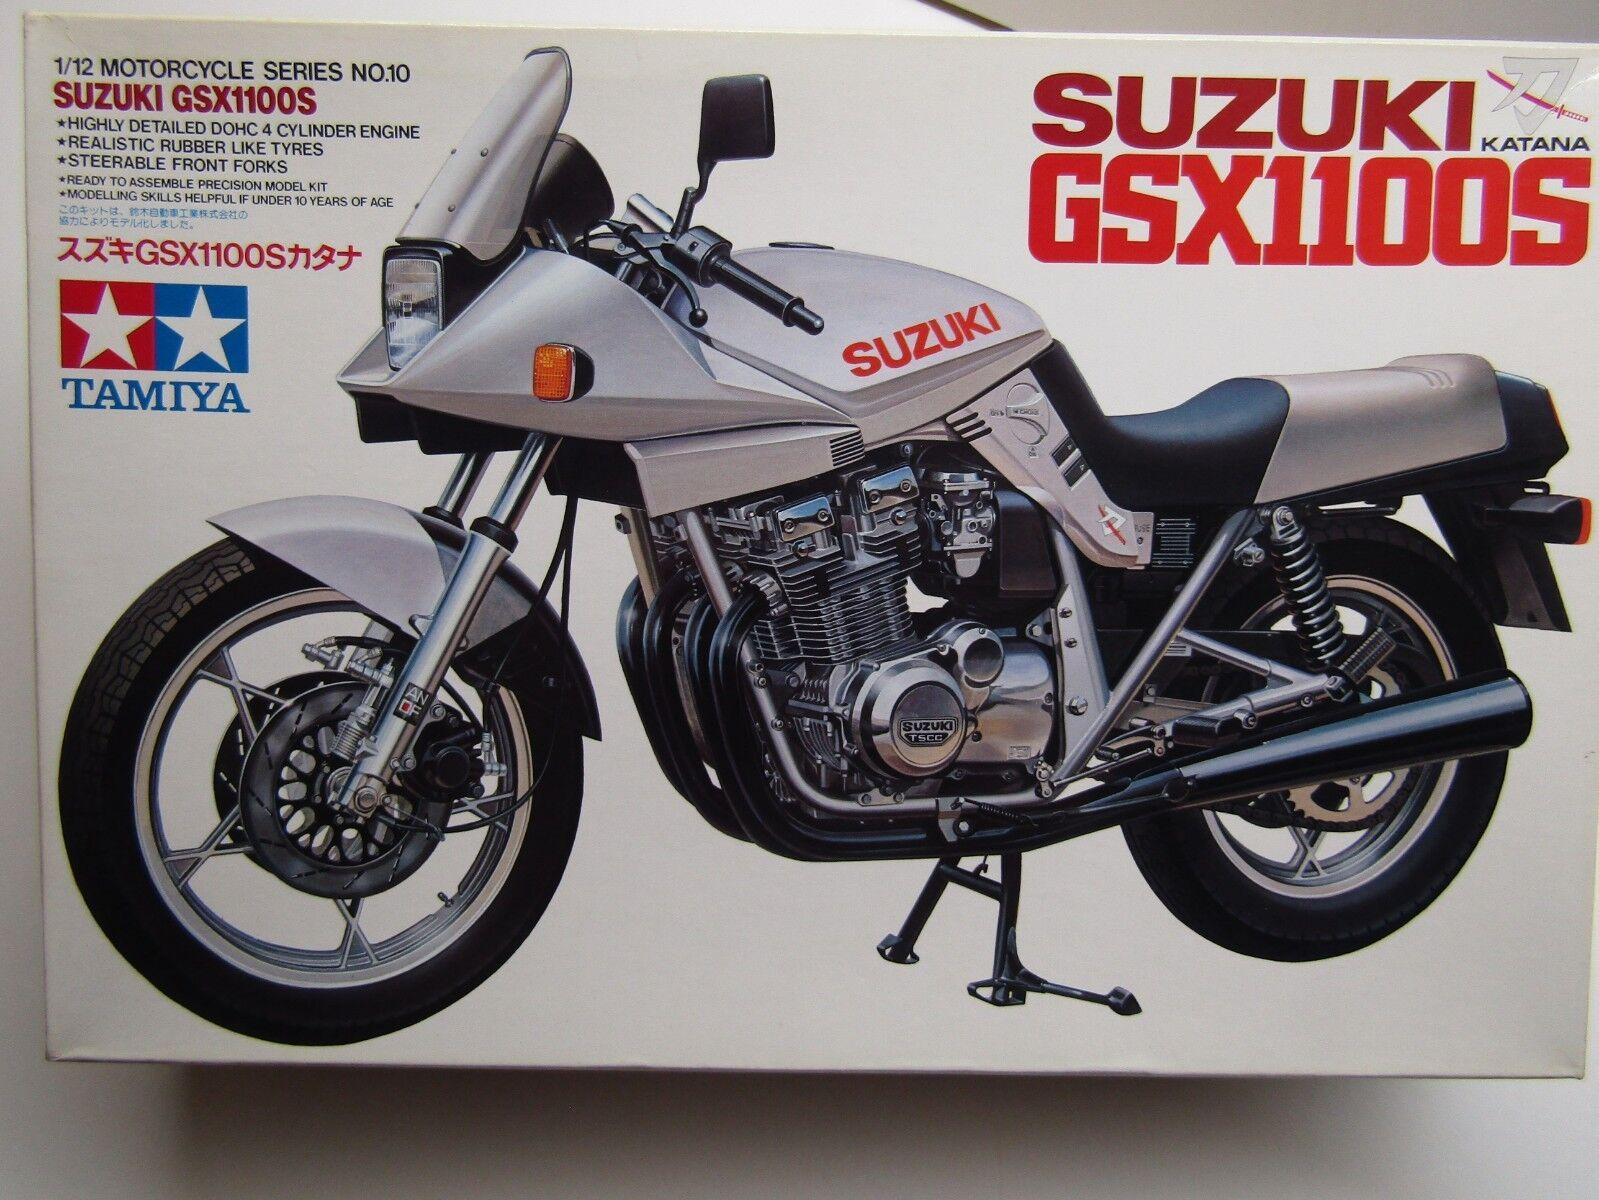 Tamiya Vintage 1 12 Scale Suzuki Suzuki Suzuki GSX1100S Katana Model Kit - New 900 c4ae95